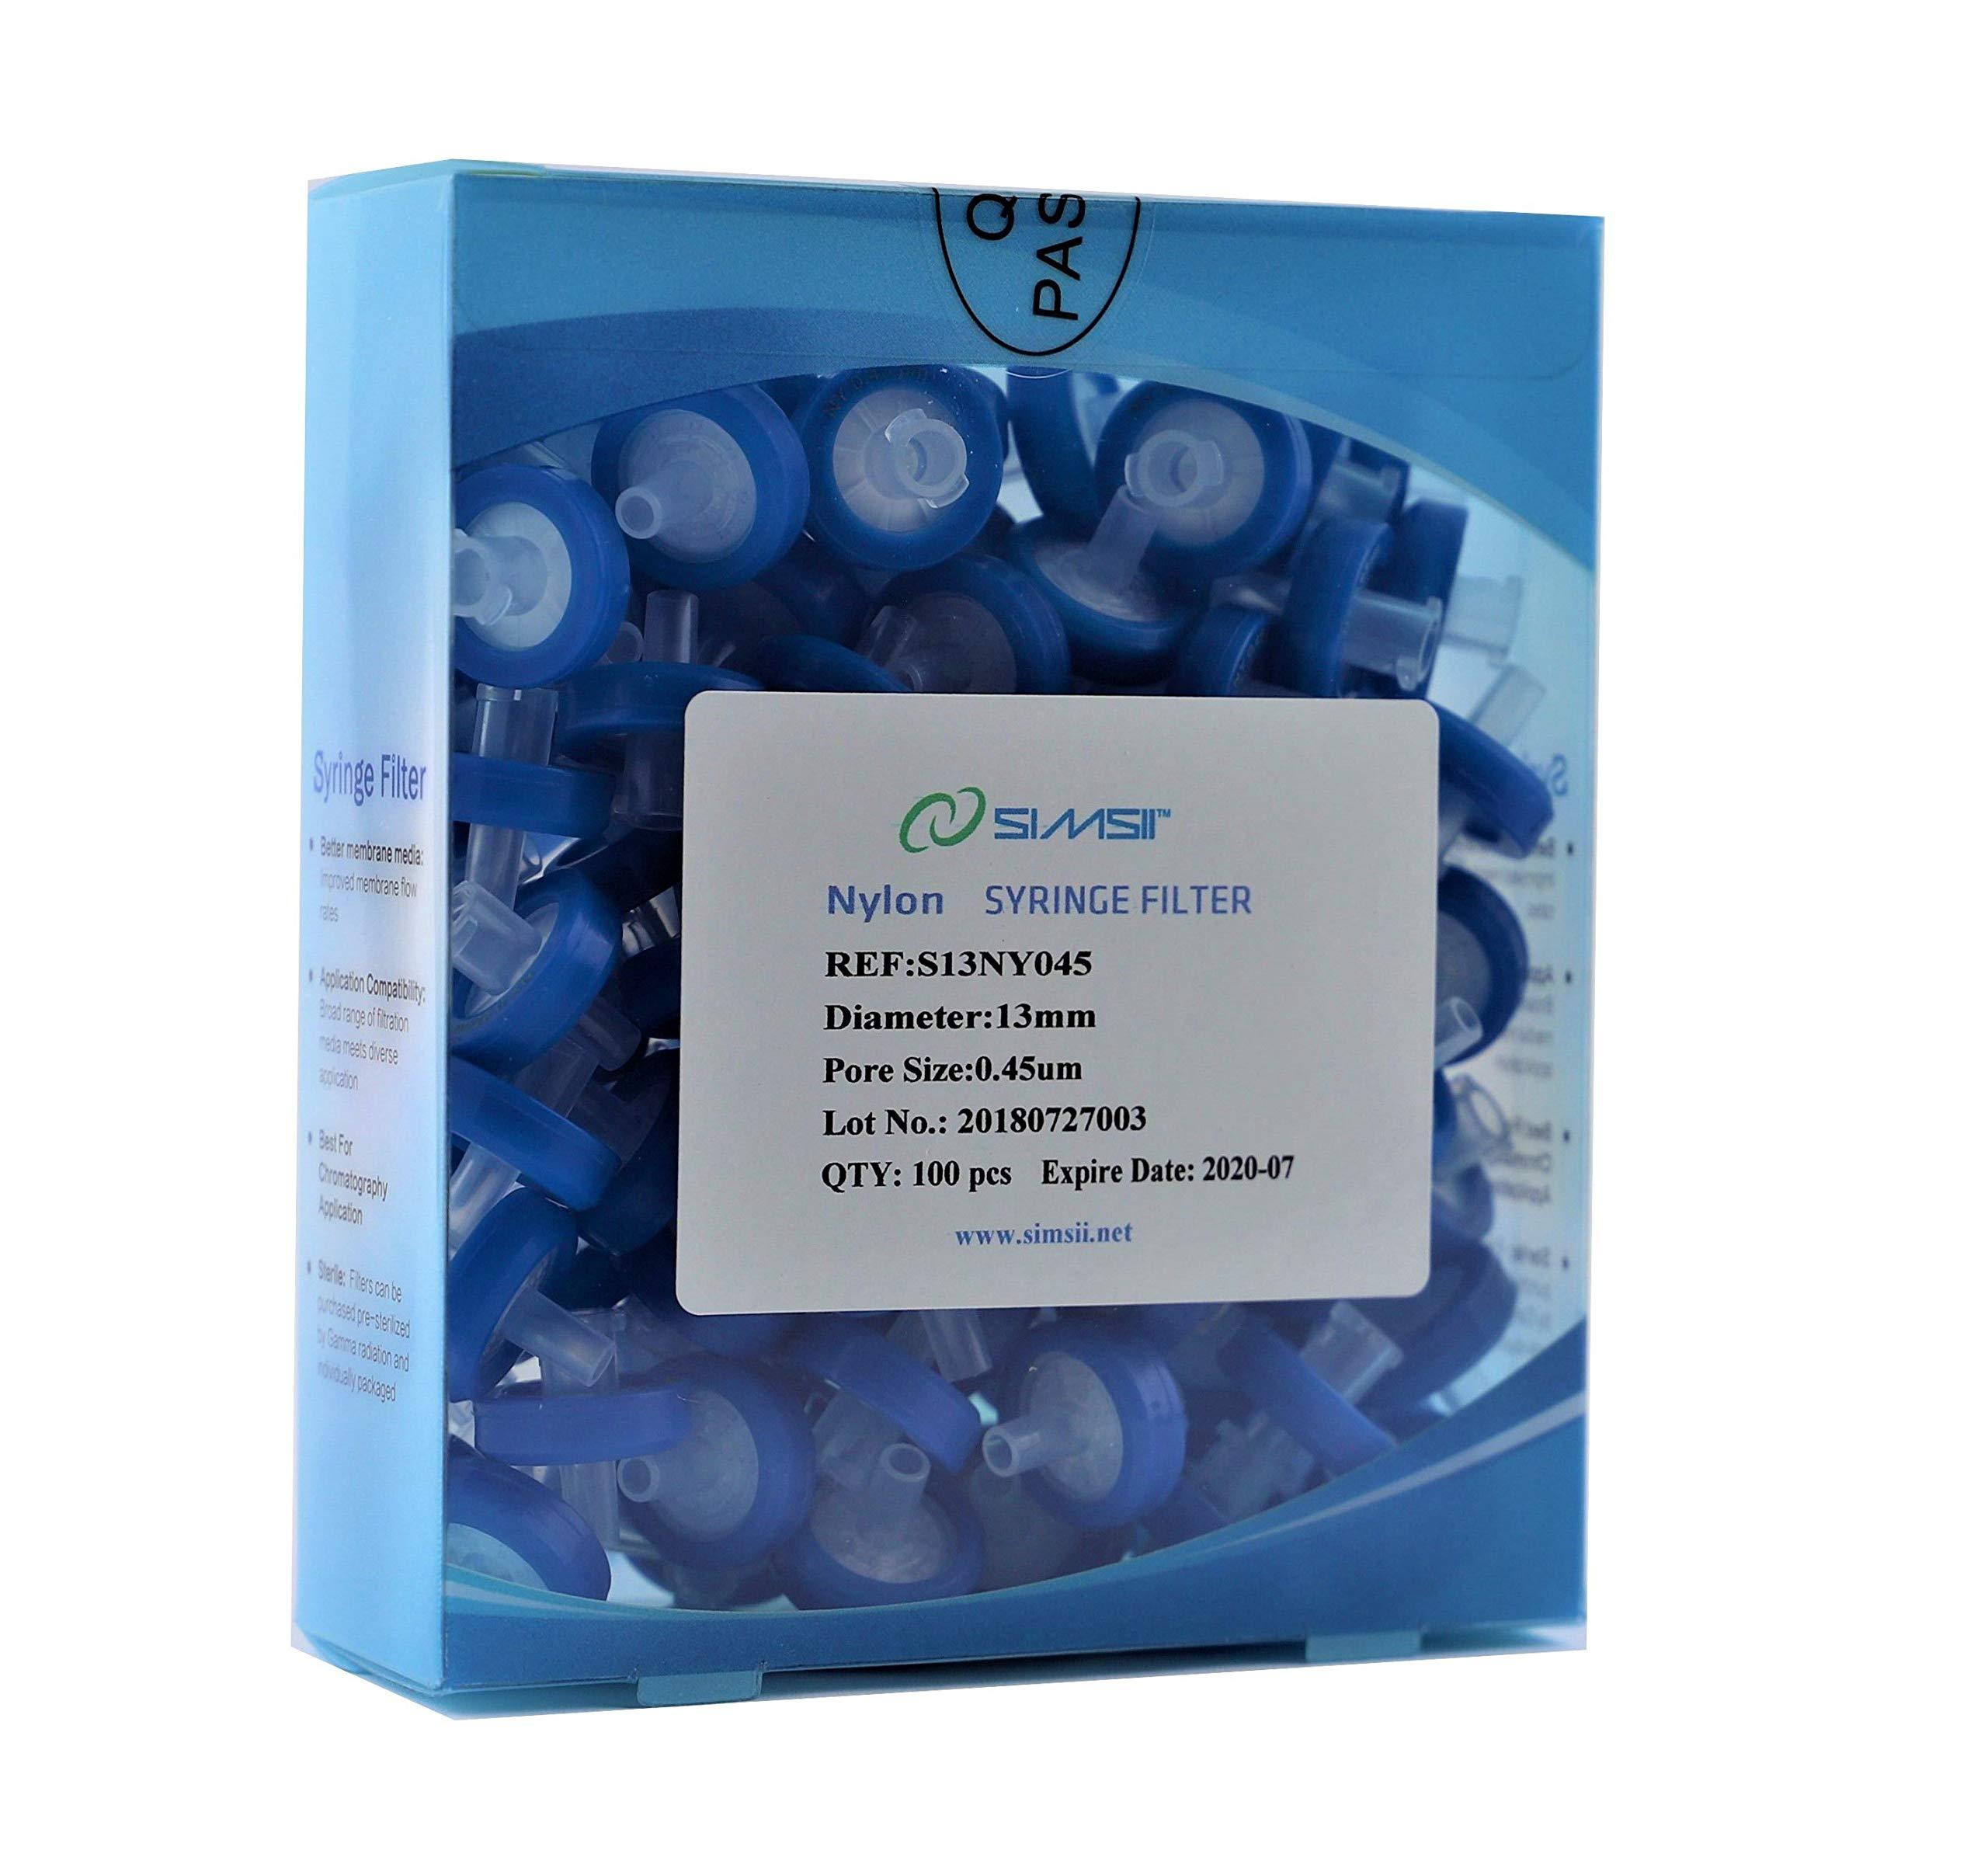 Simsii Syringe Filter, Nylon, Diameter 13 mm, Pore Size 0.45 um, Pack of 100 by Simsii